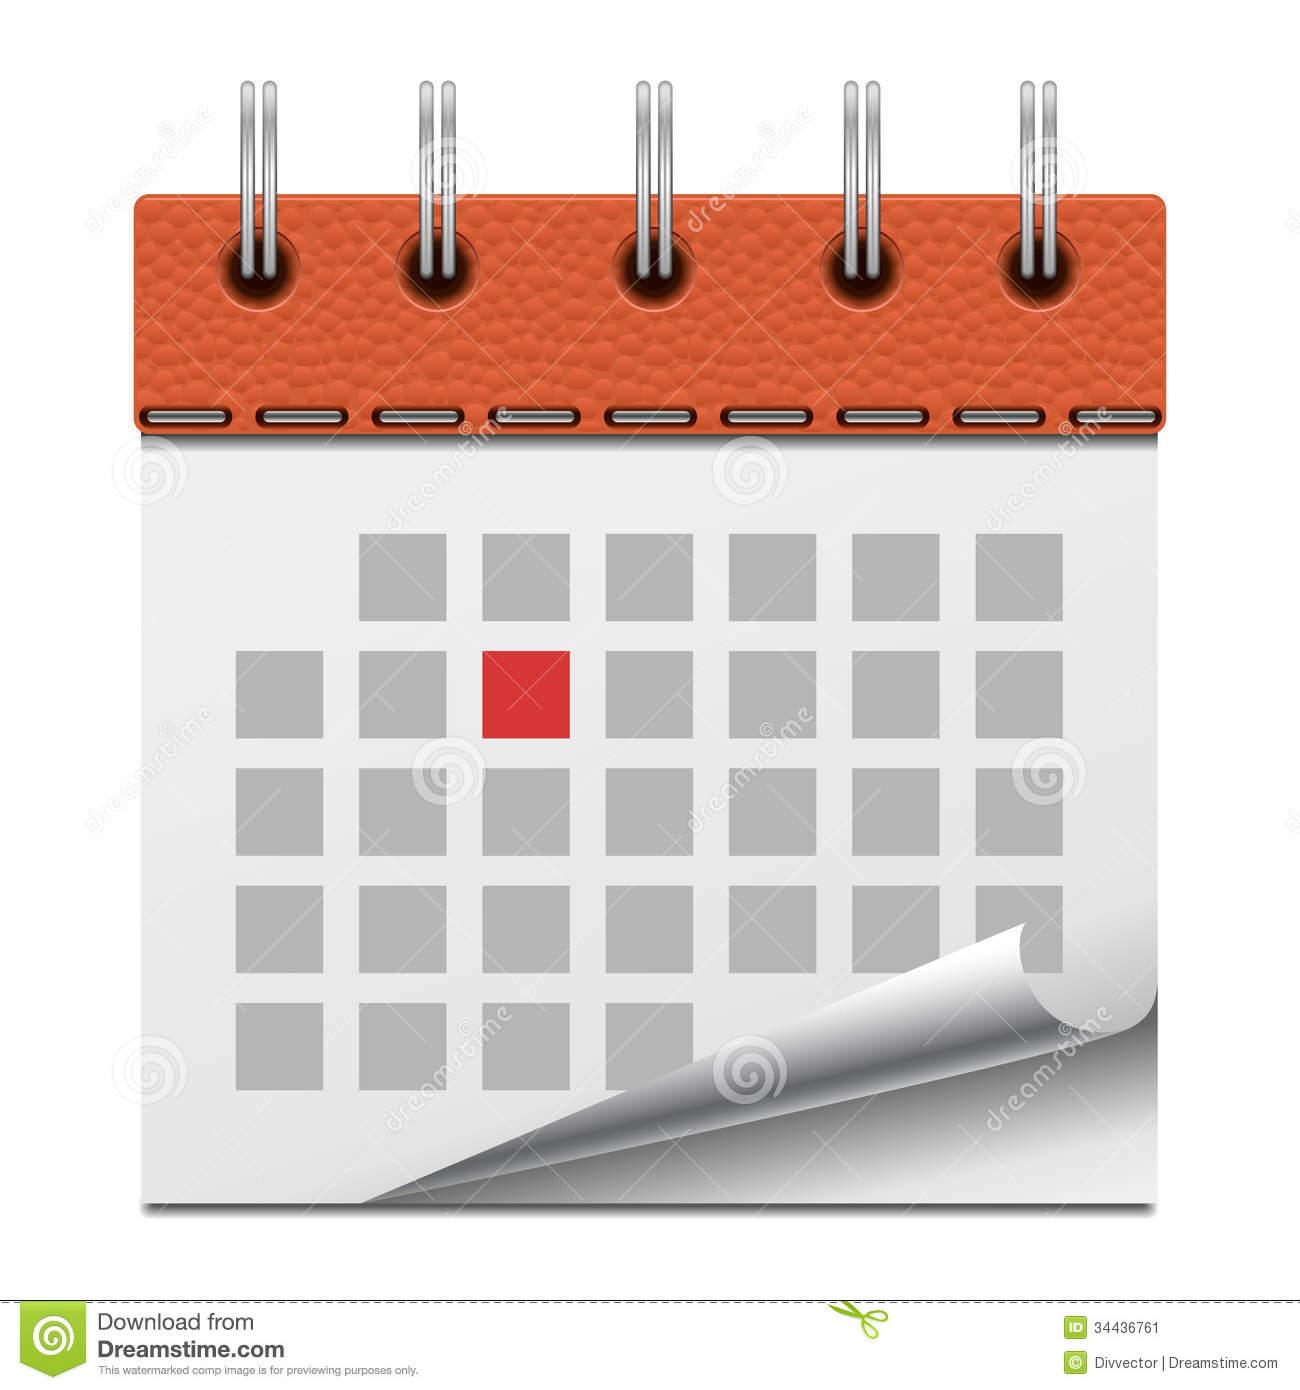 Blank Calendar Svg : Vector generic calendar images free blank